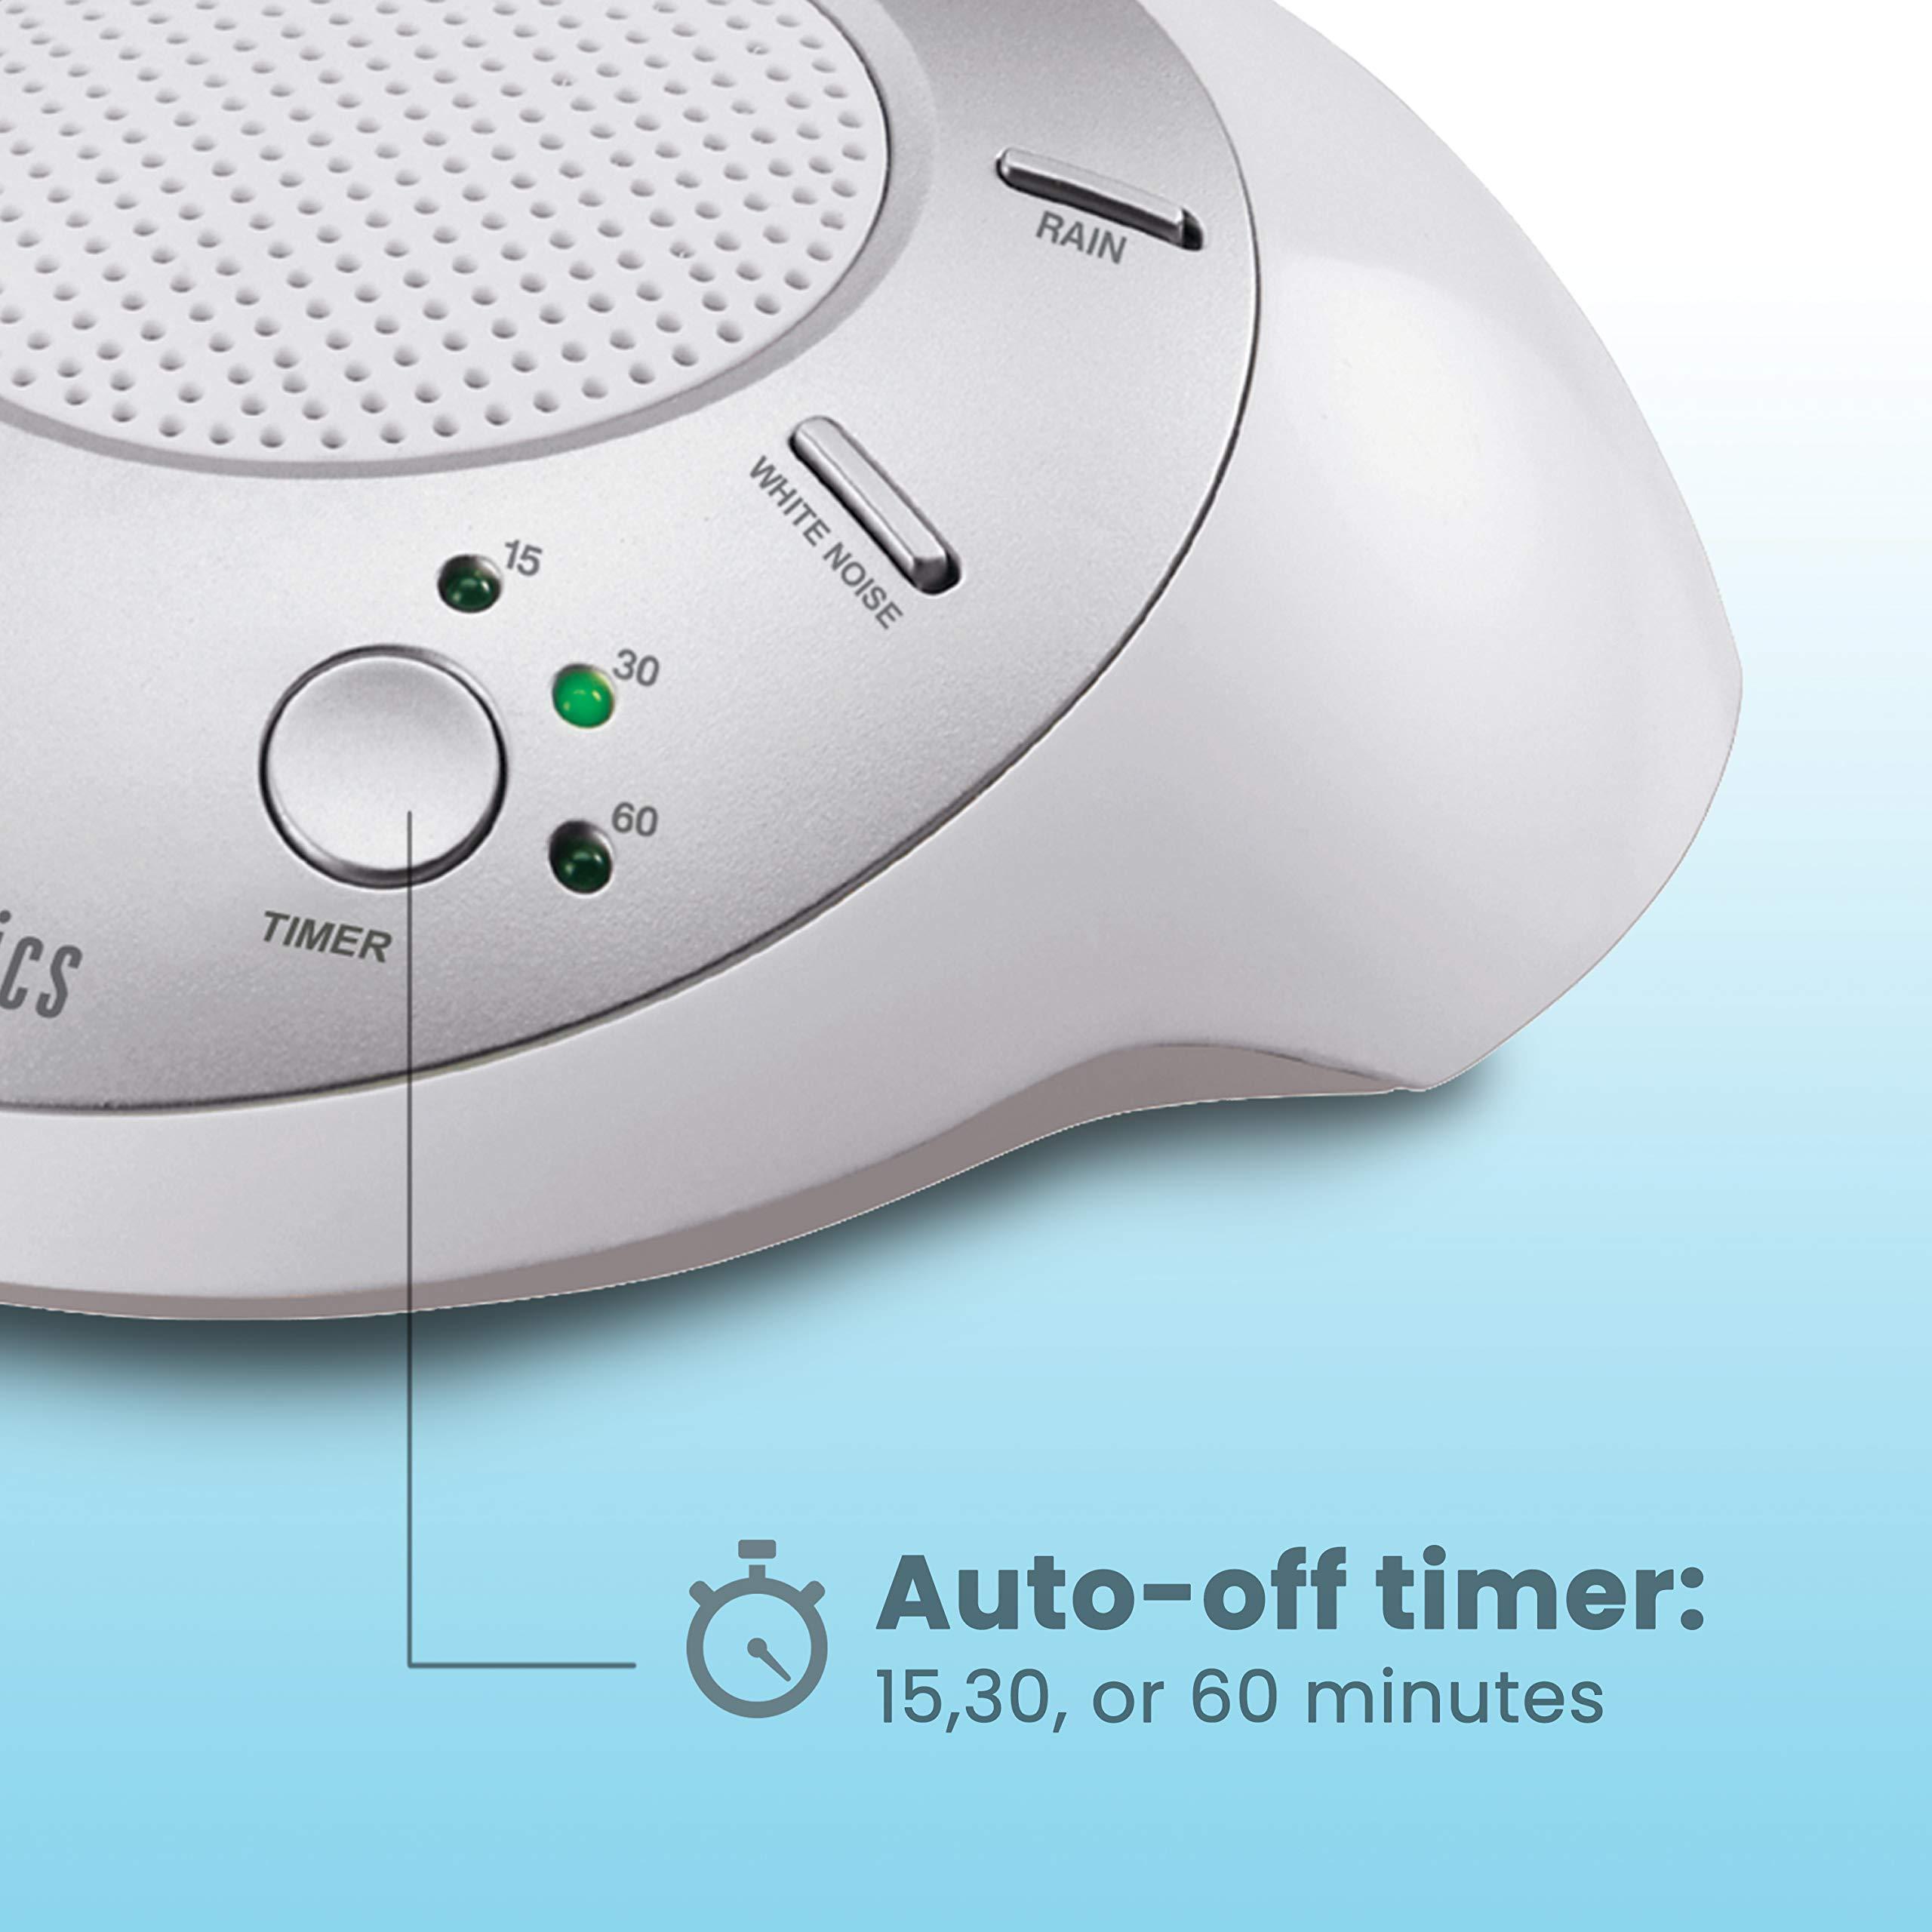 White Noise Sound Machine Portable Sleep Therapy For